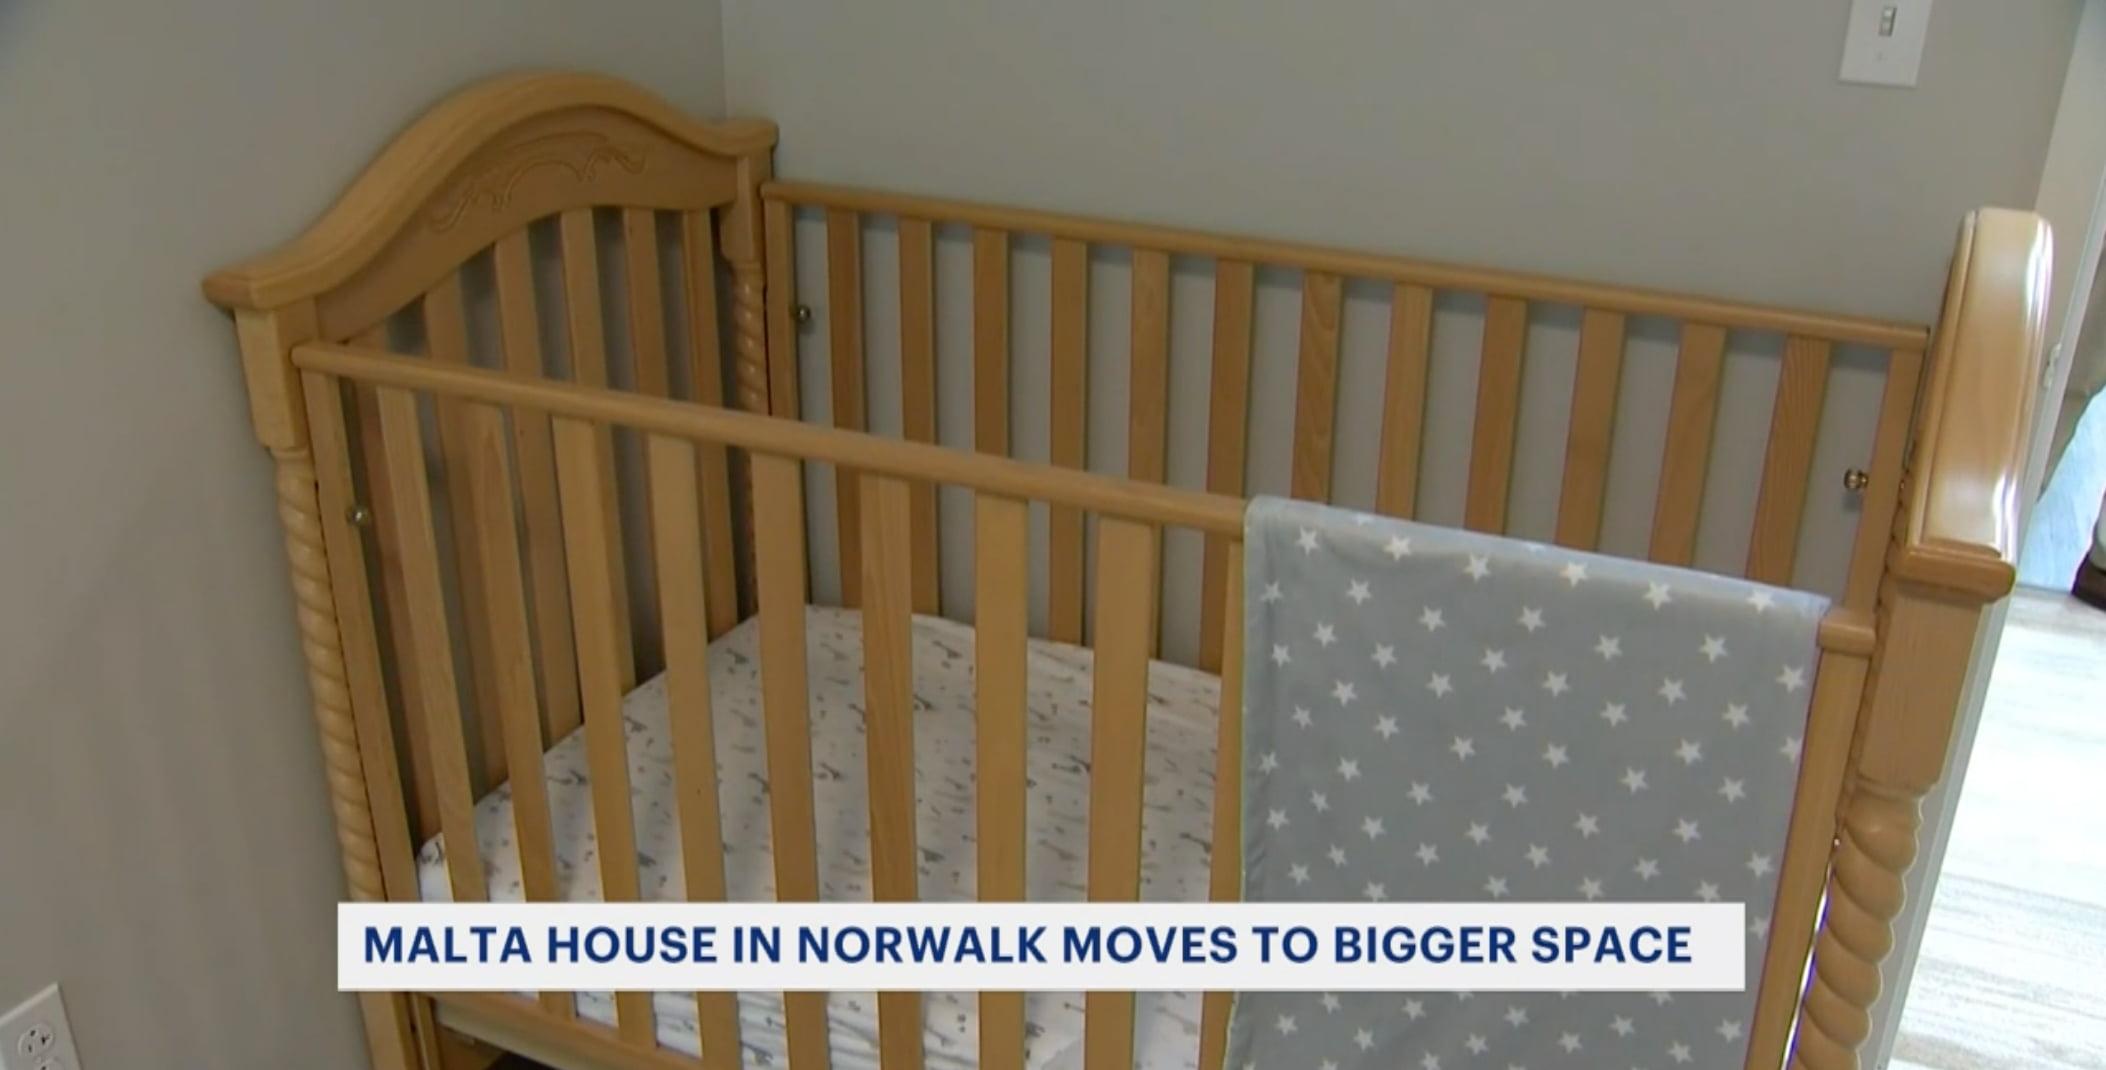 Ribbon-cutting held for Norwalk's new shelter for homeless mothers